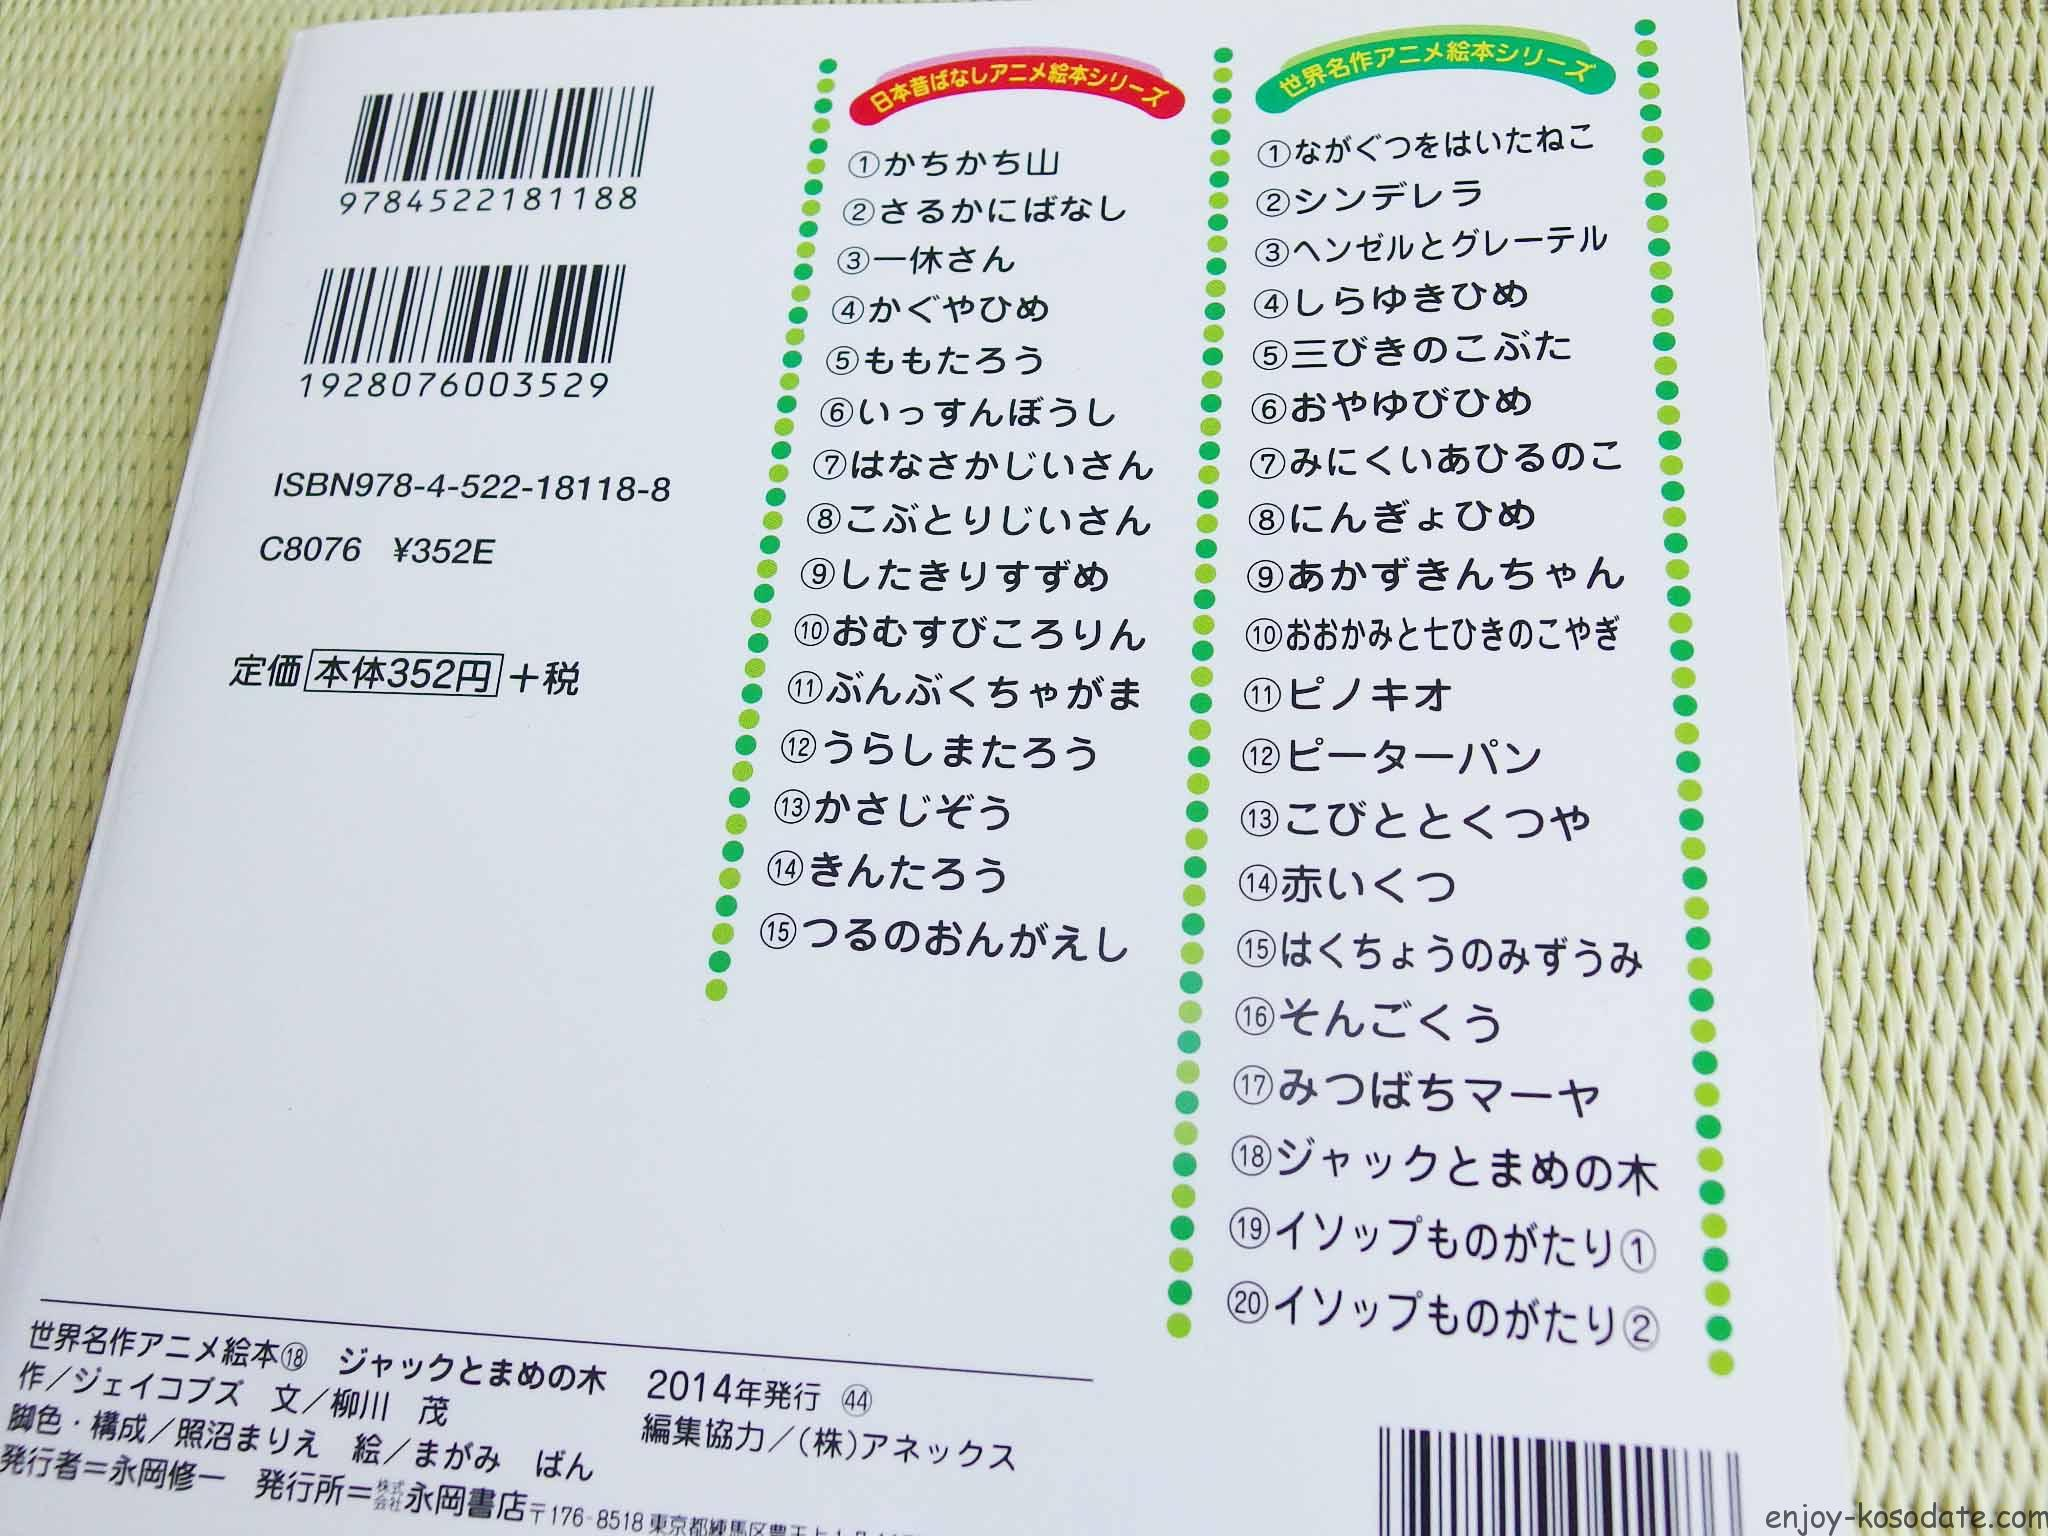 IMGP0547 - コピー